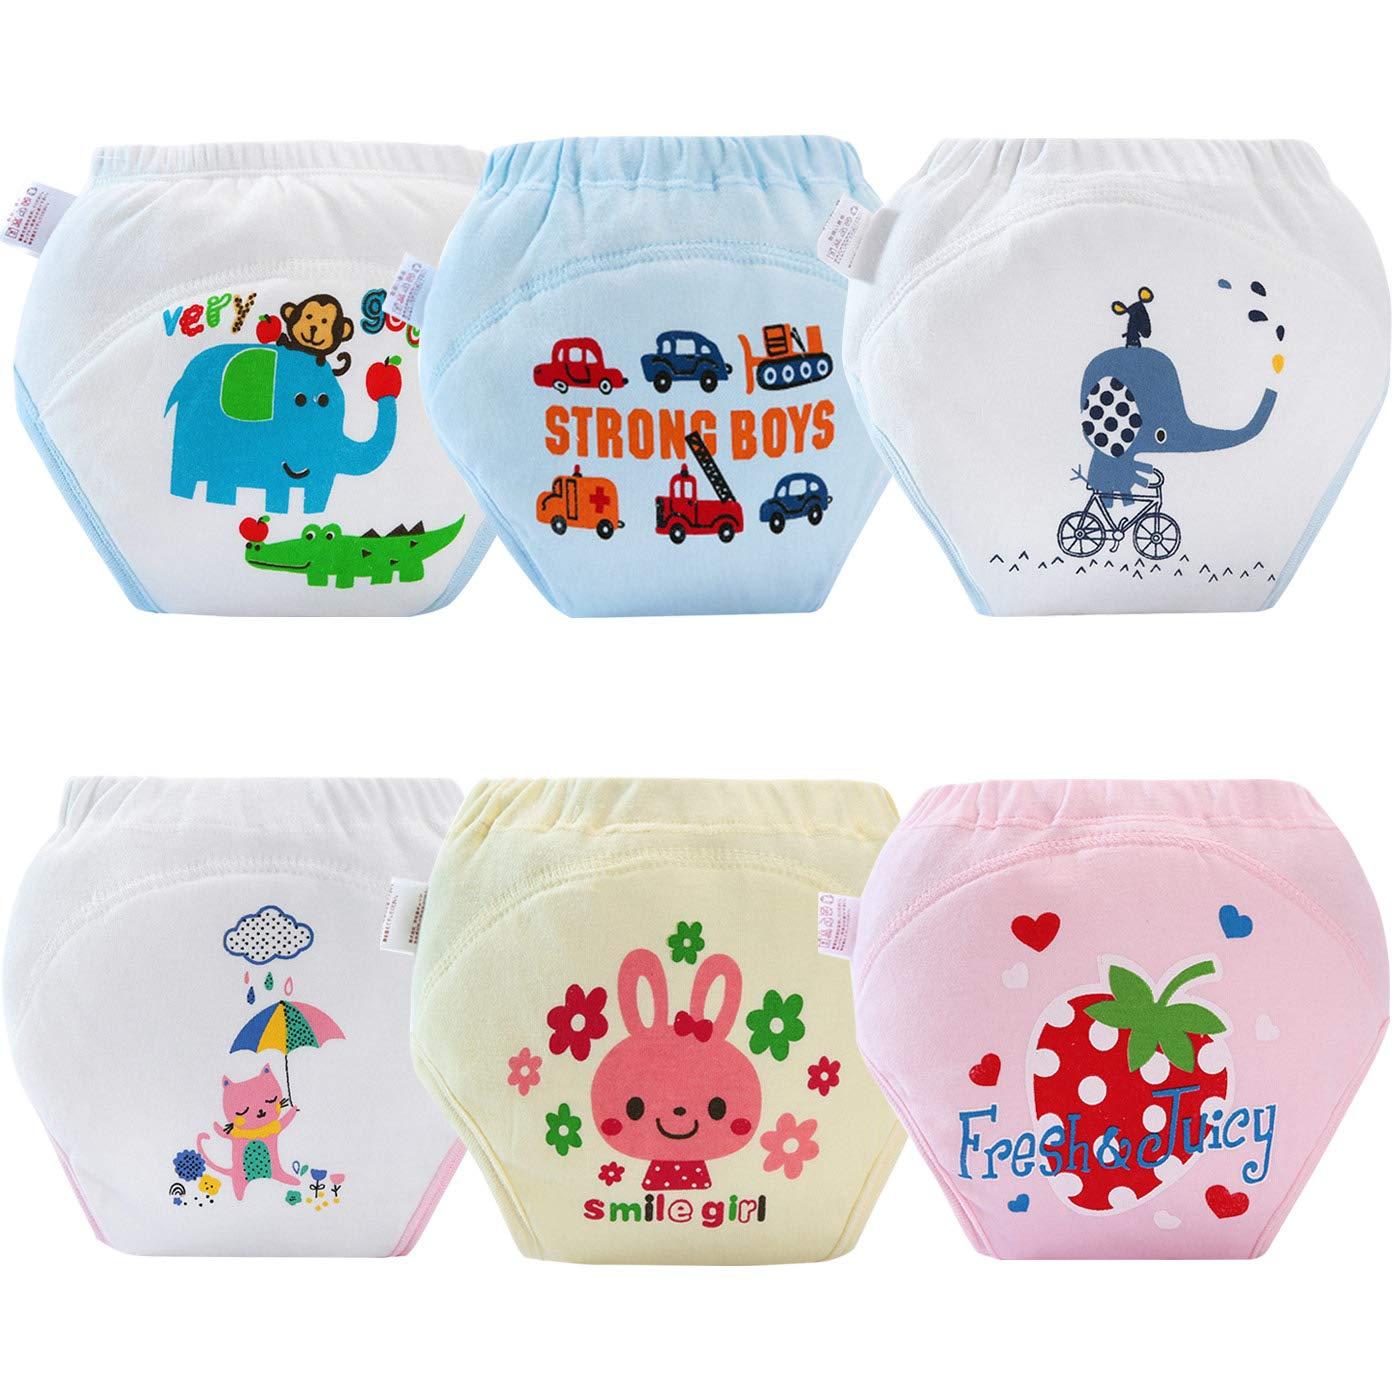 AUBIG Unisex Baby Training Underwear 4 Layers Cotton Diaper Pants Pack of 6 H101FMW0004-05